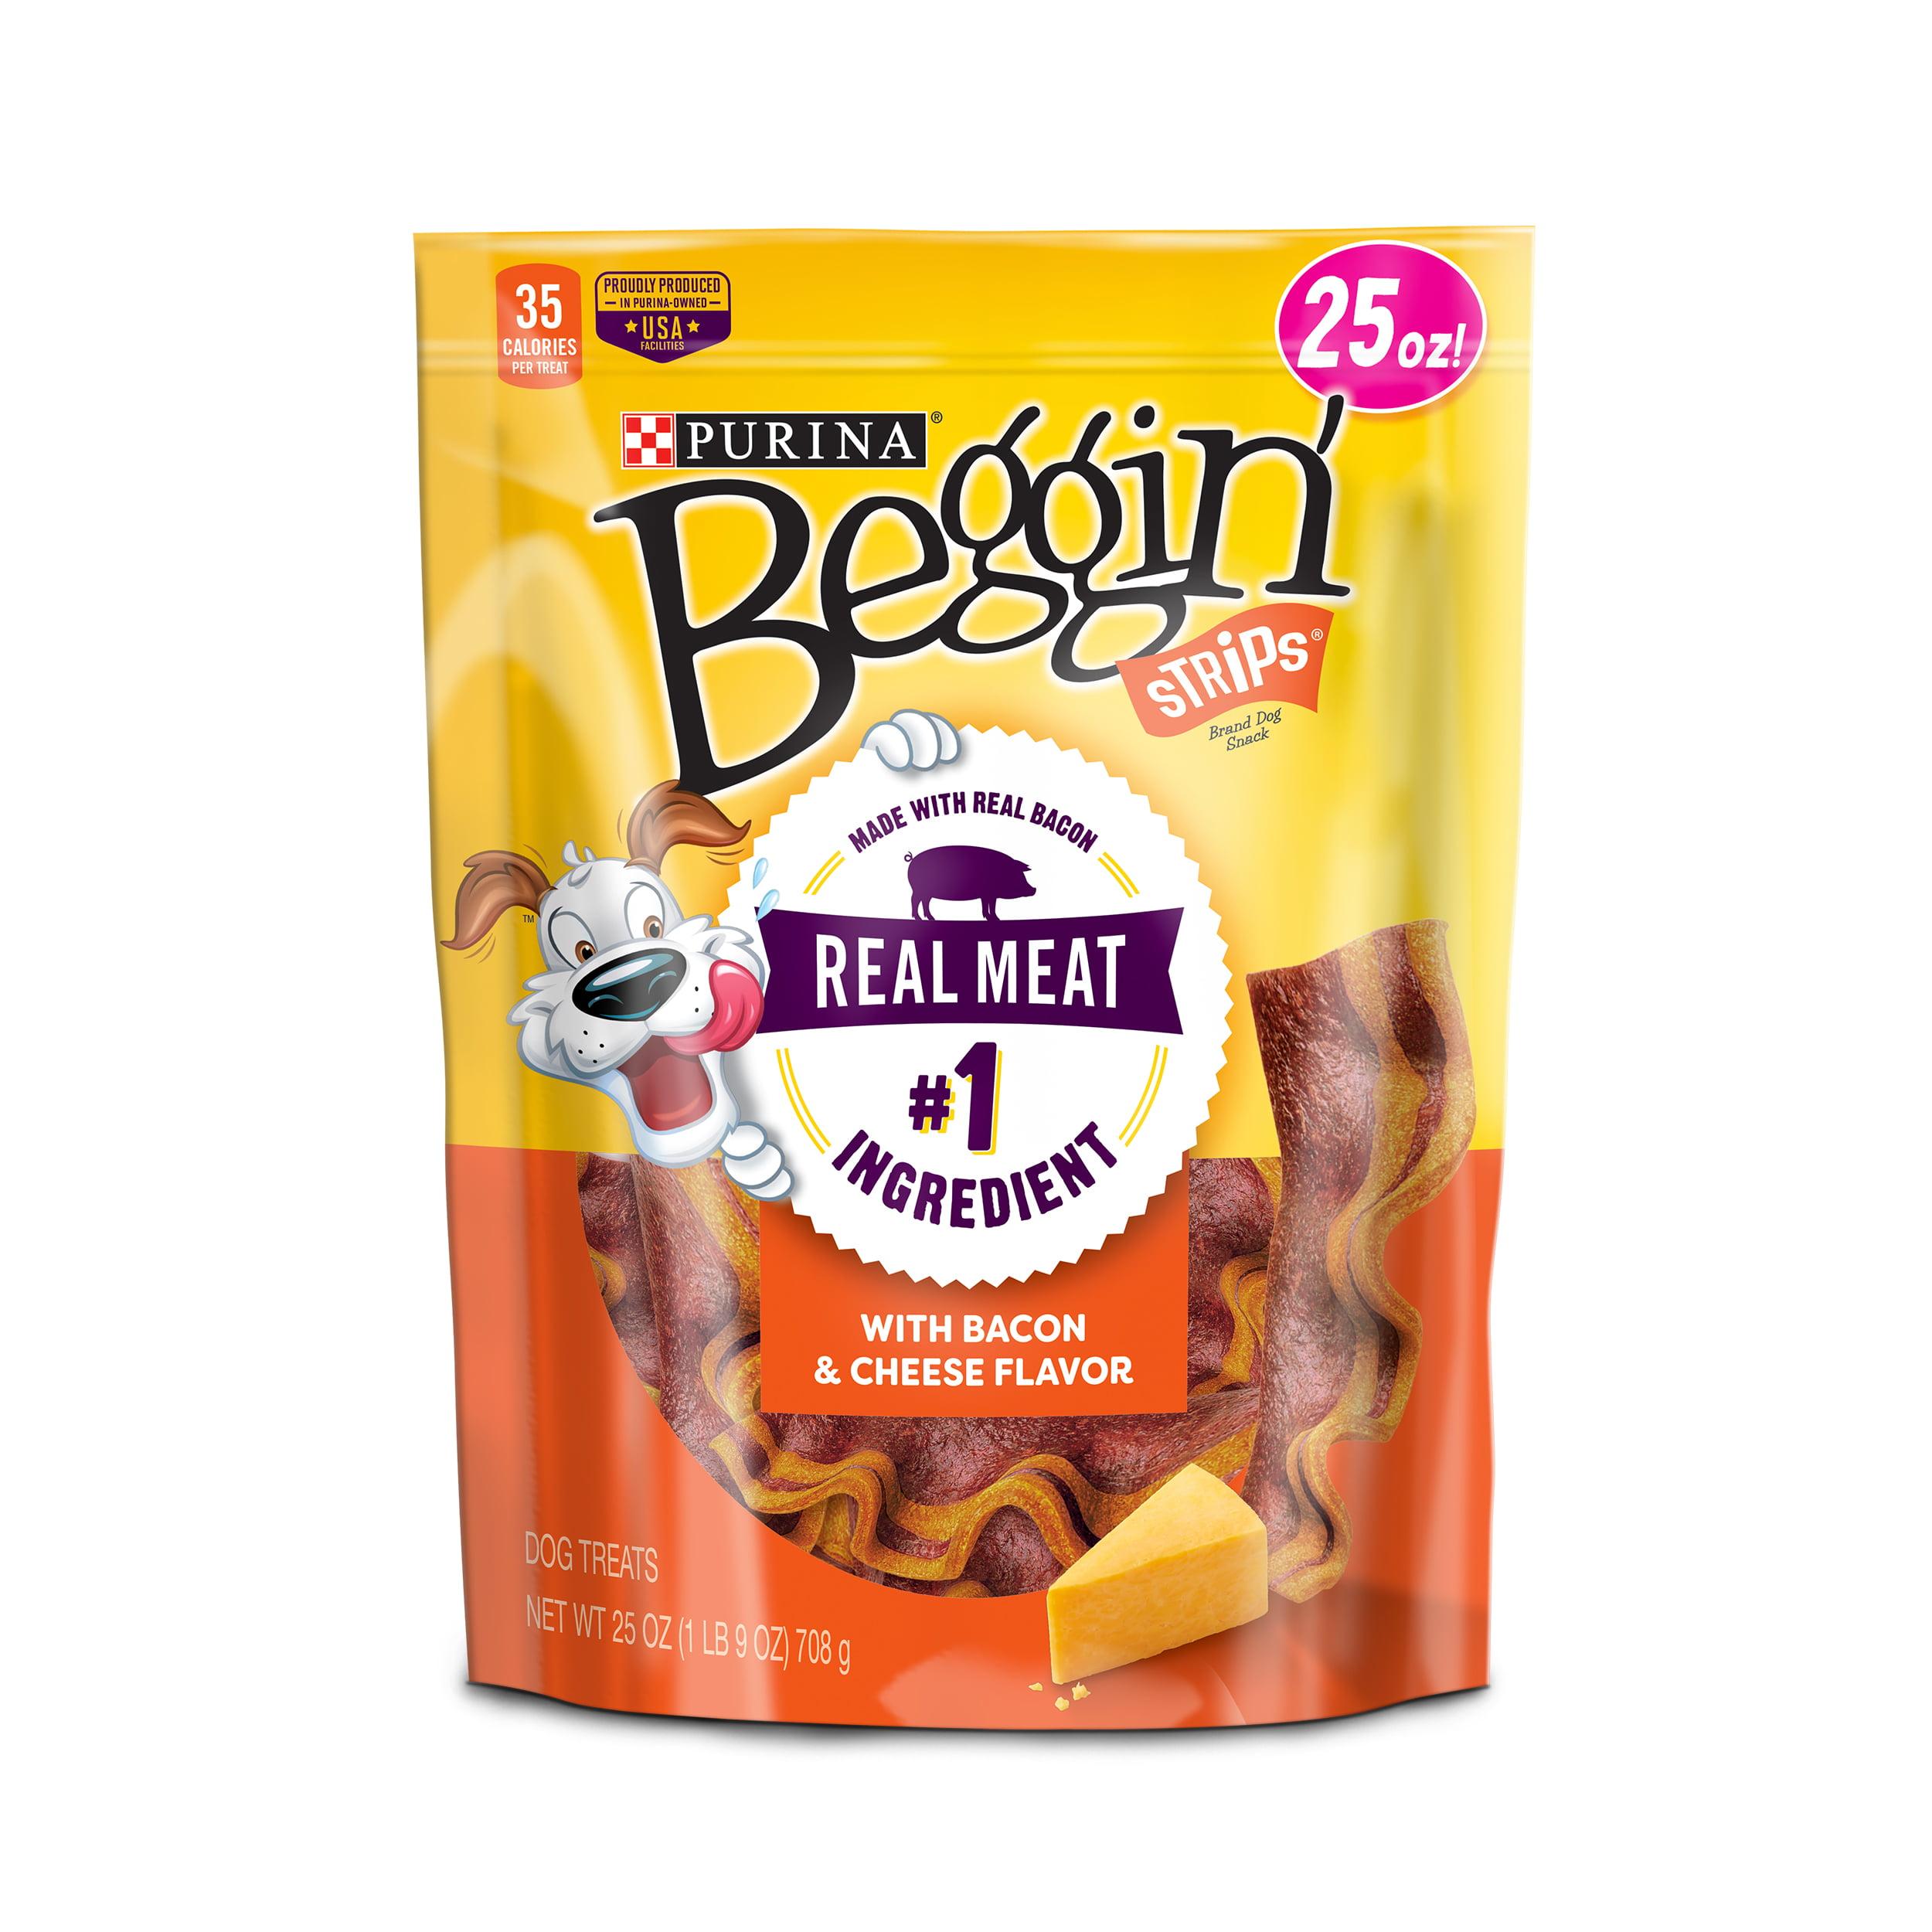 Purina Beggin' Strips Bacon & Cheese Flavors Dog Treats - 25 oz. Pouch